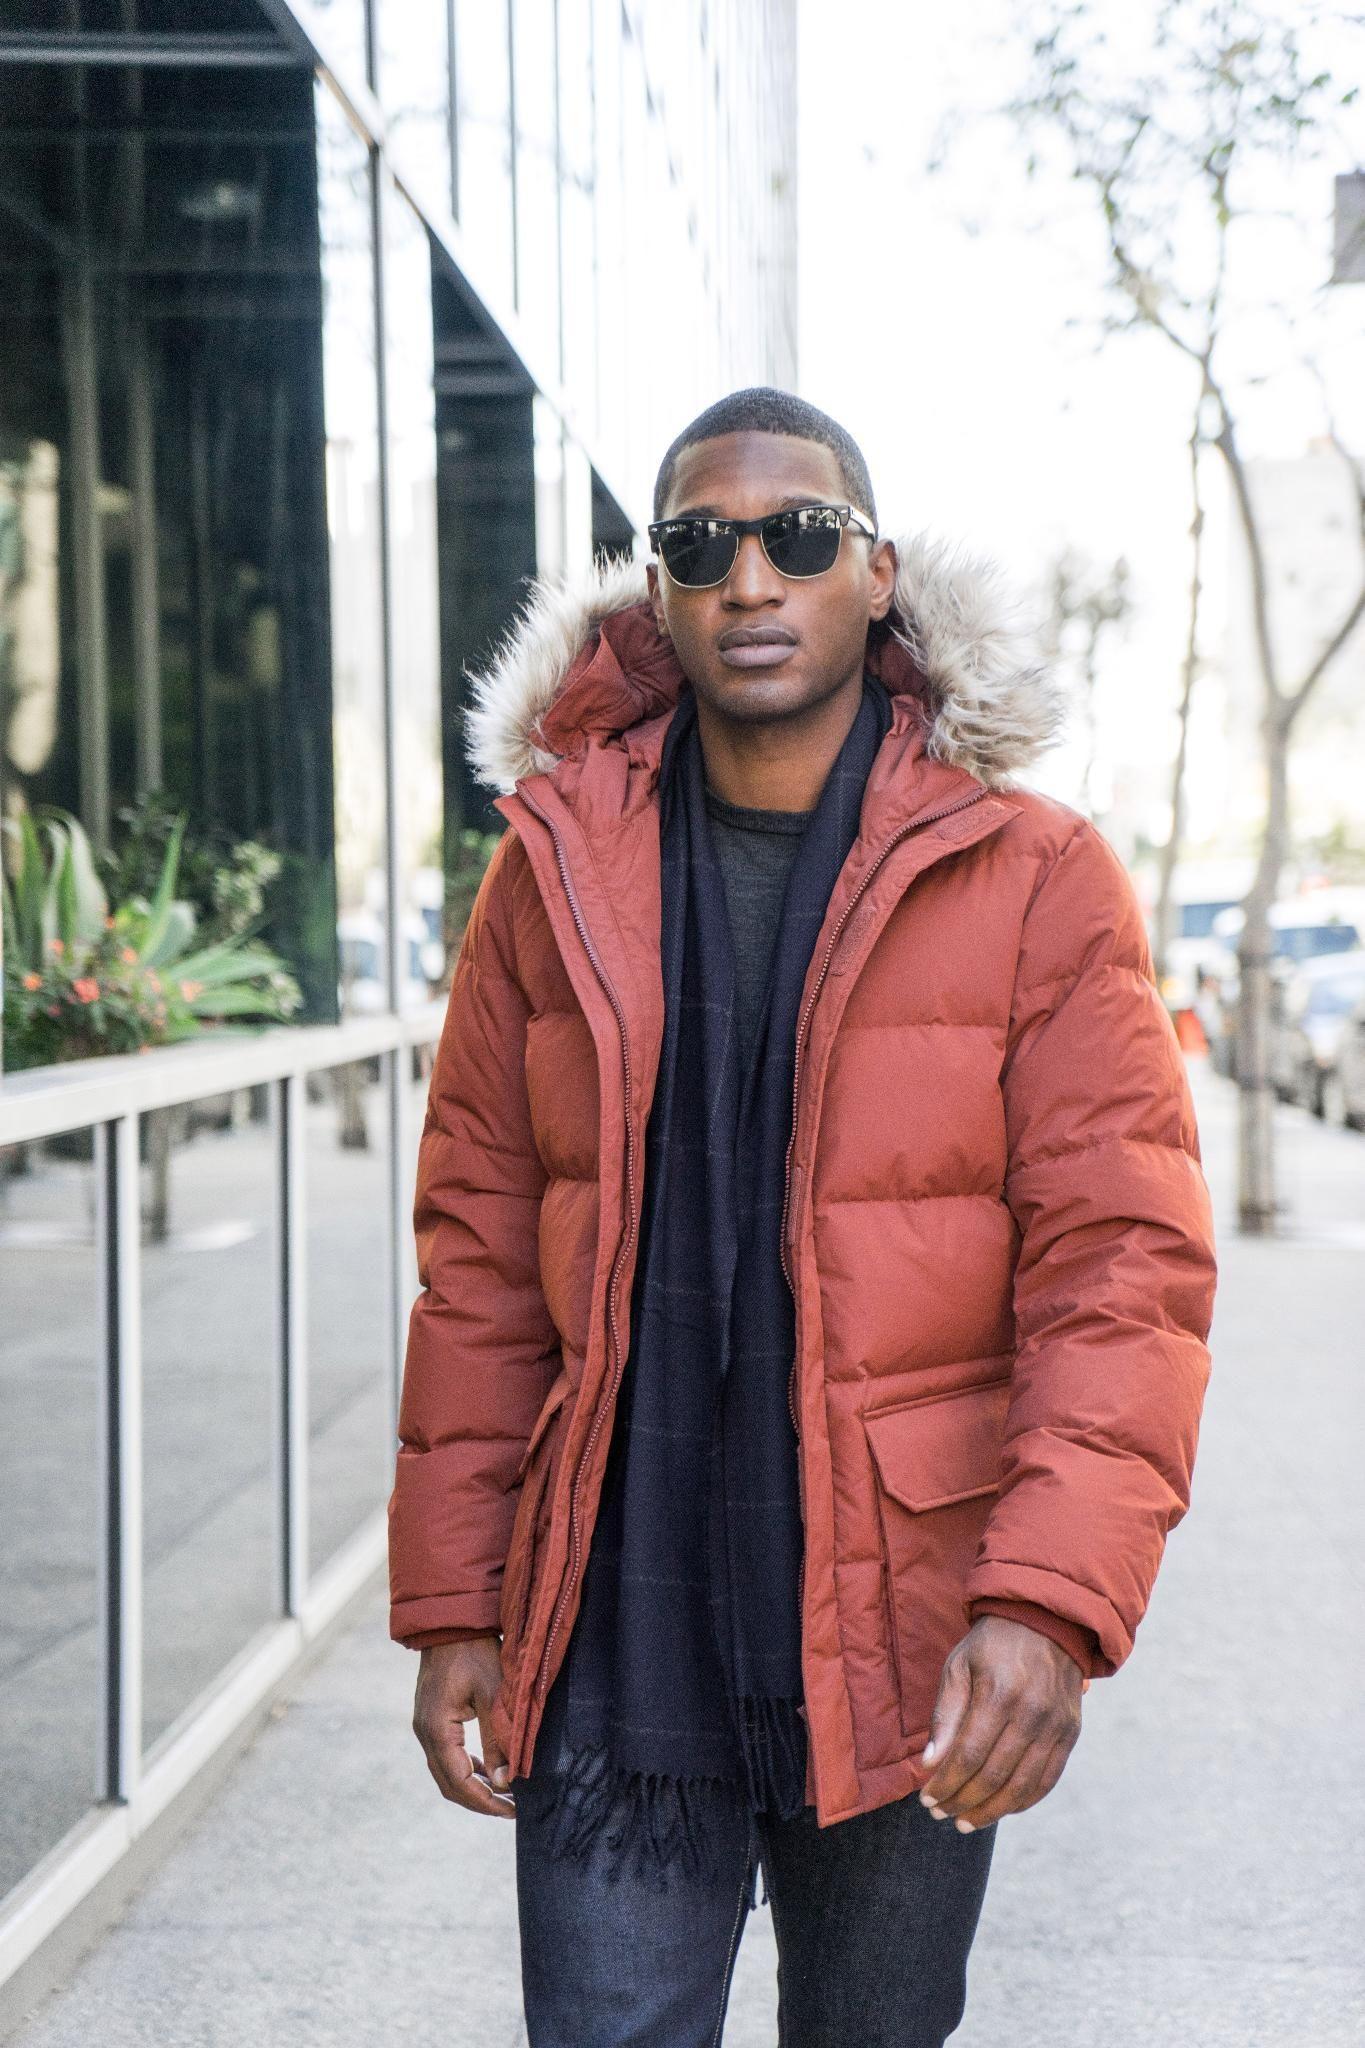 Men Down Jacket Jackets Men Fashion Jackets Down Jacket [ 2048 x 1365 Pixel ]